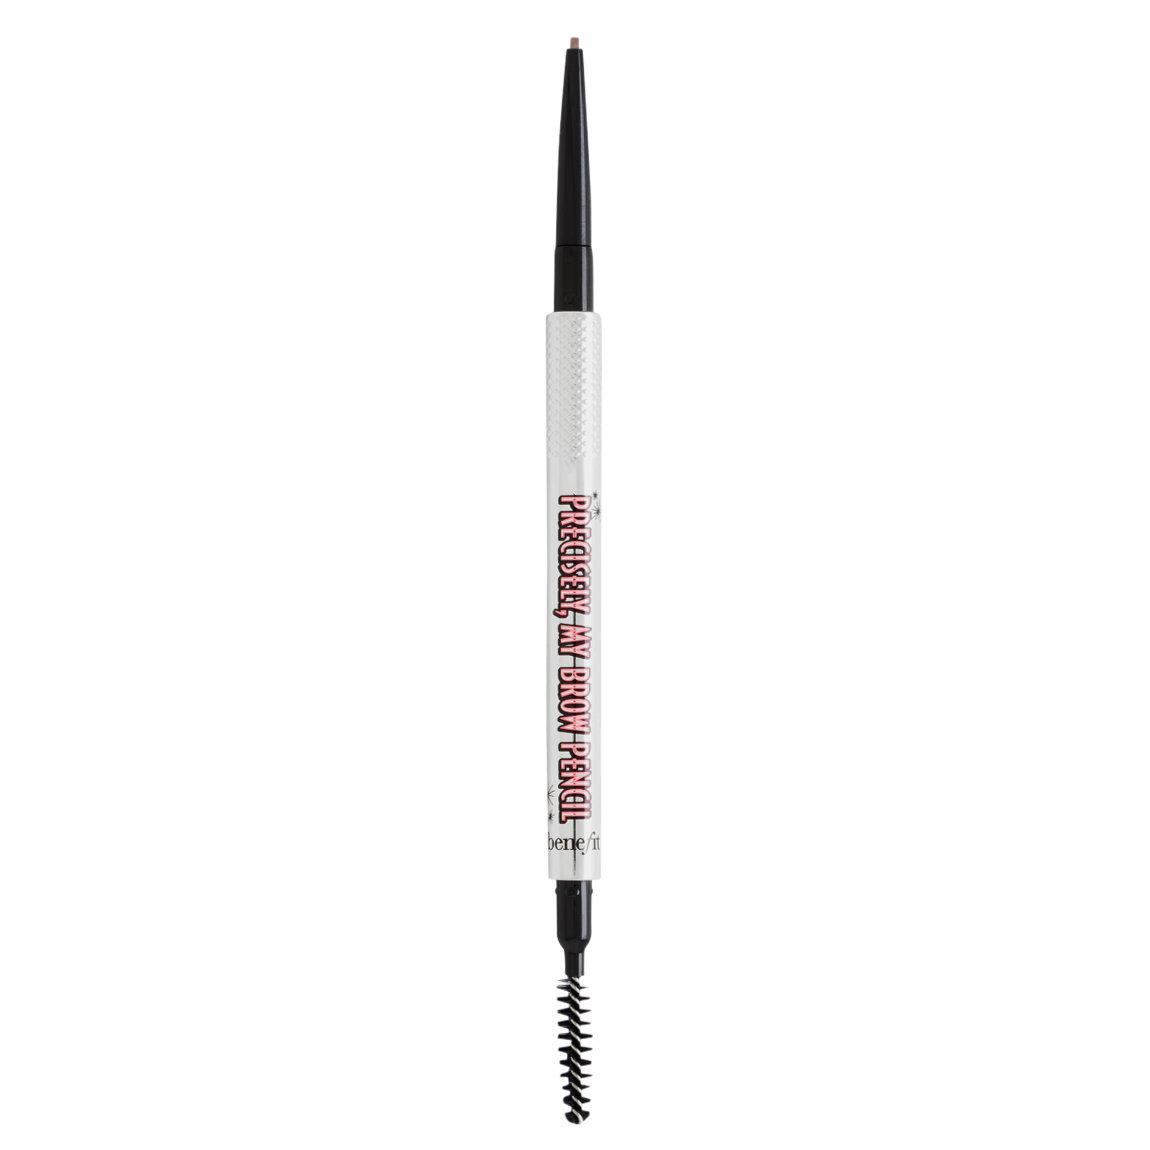 Benefit Precisely, My Brow Eyebrow Pencil